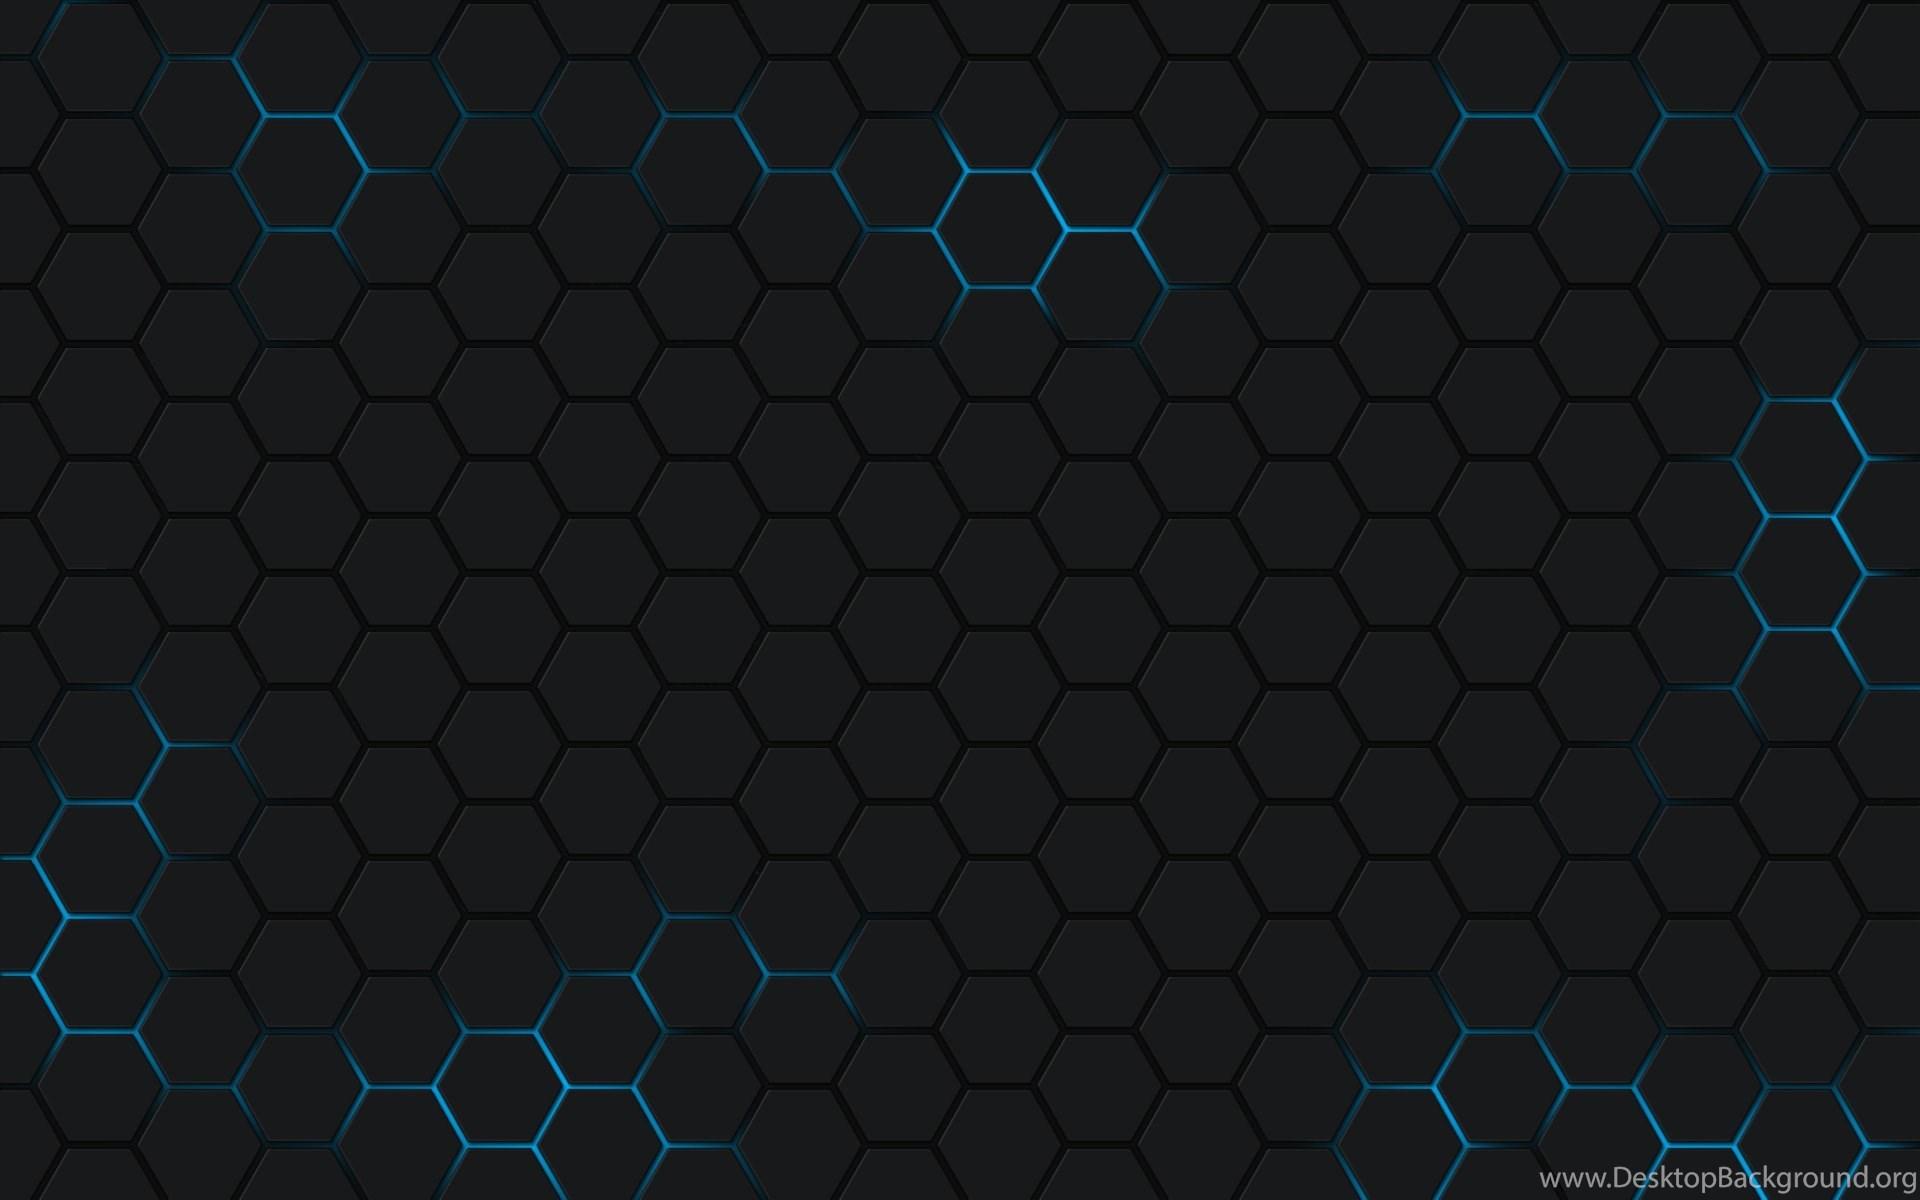 Hd wallpaper lenovo - Hd Lenovo Wallpapers